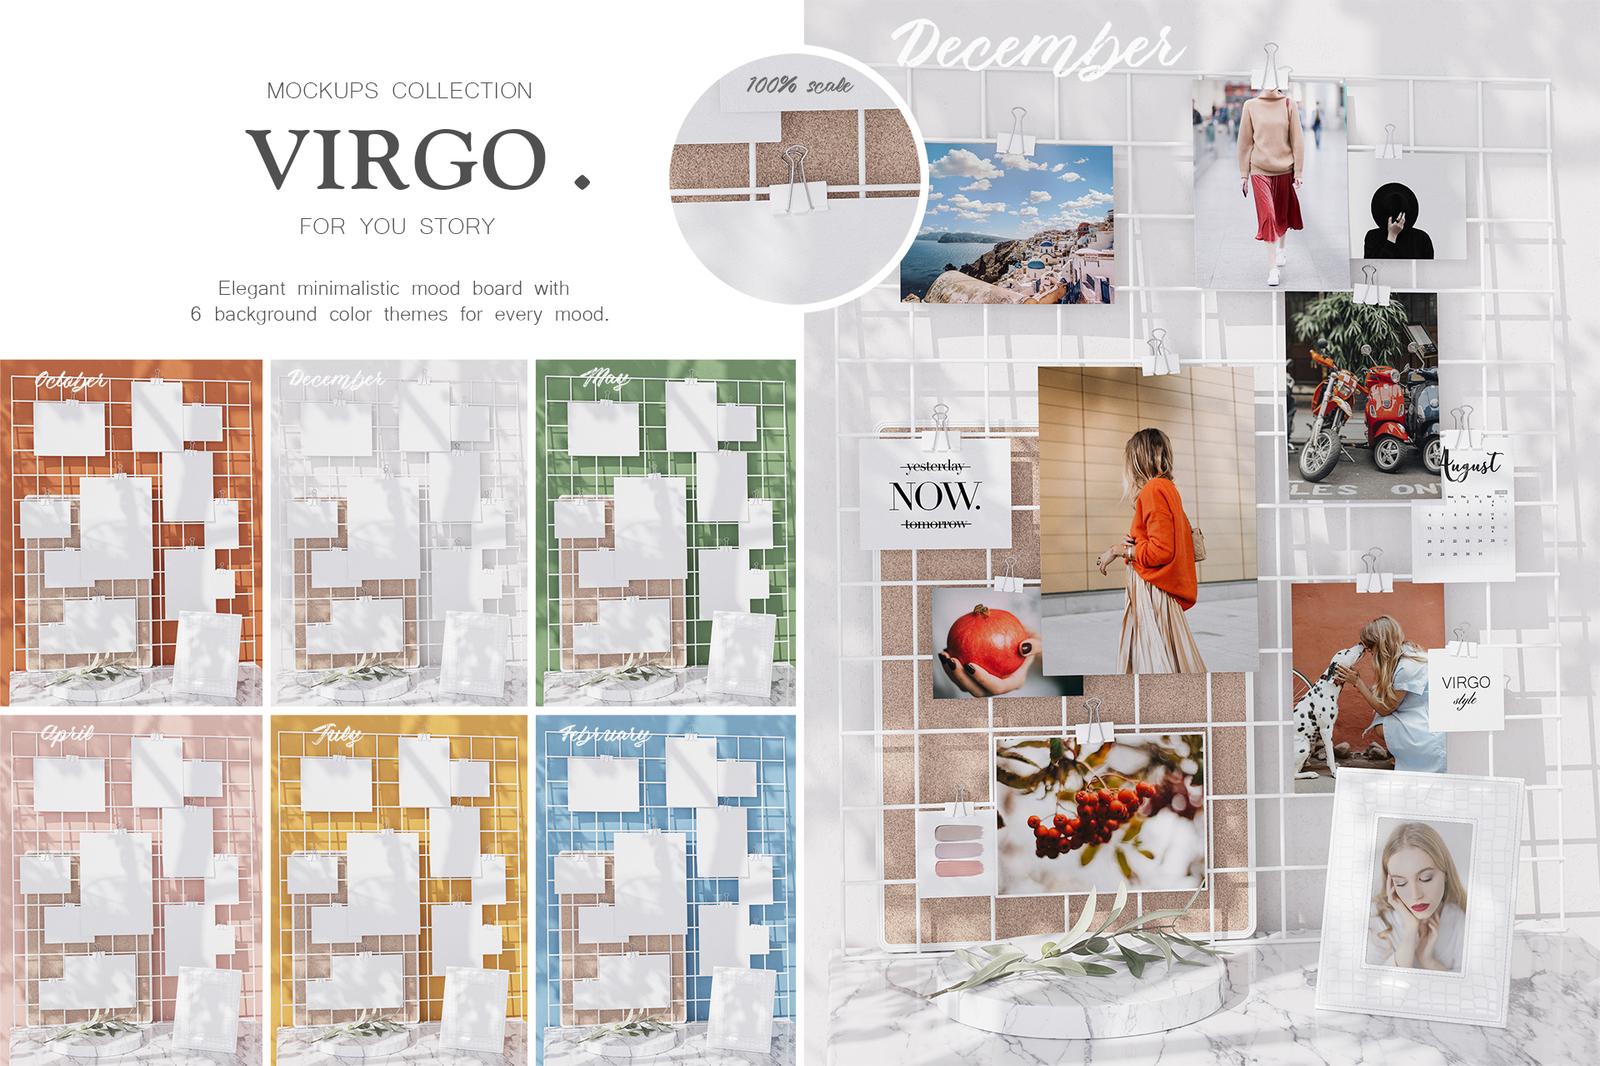 Mockups Collection - Virgo